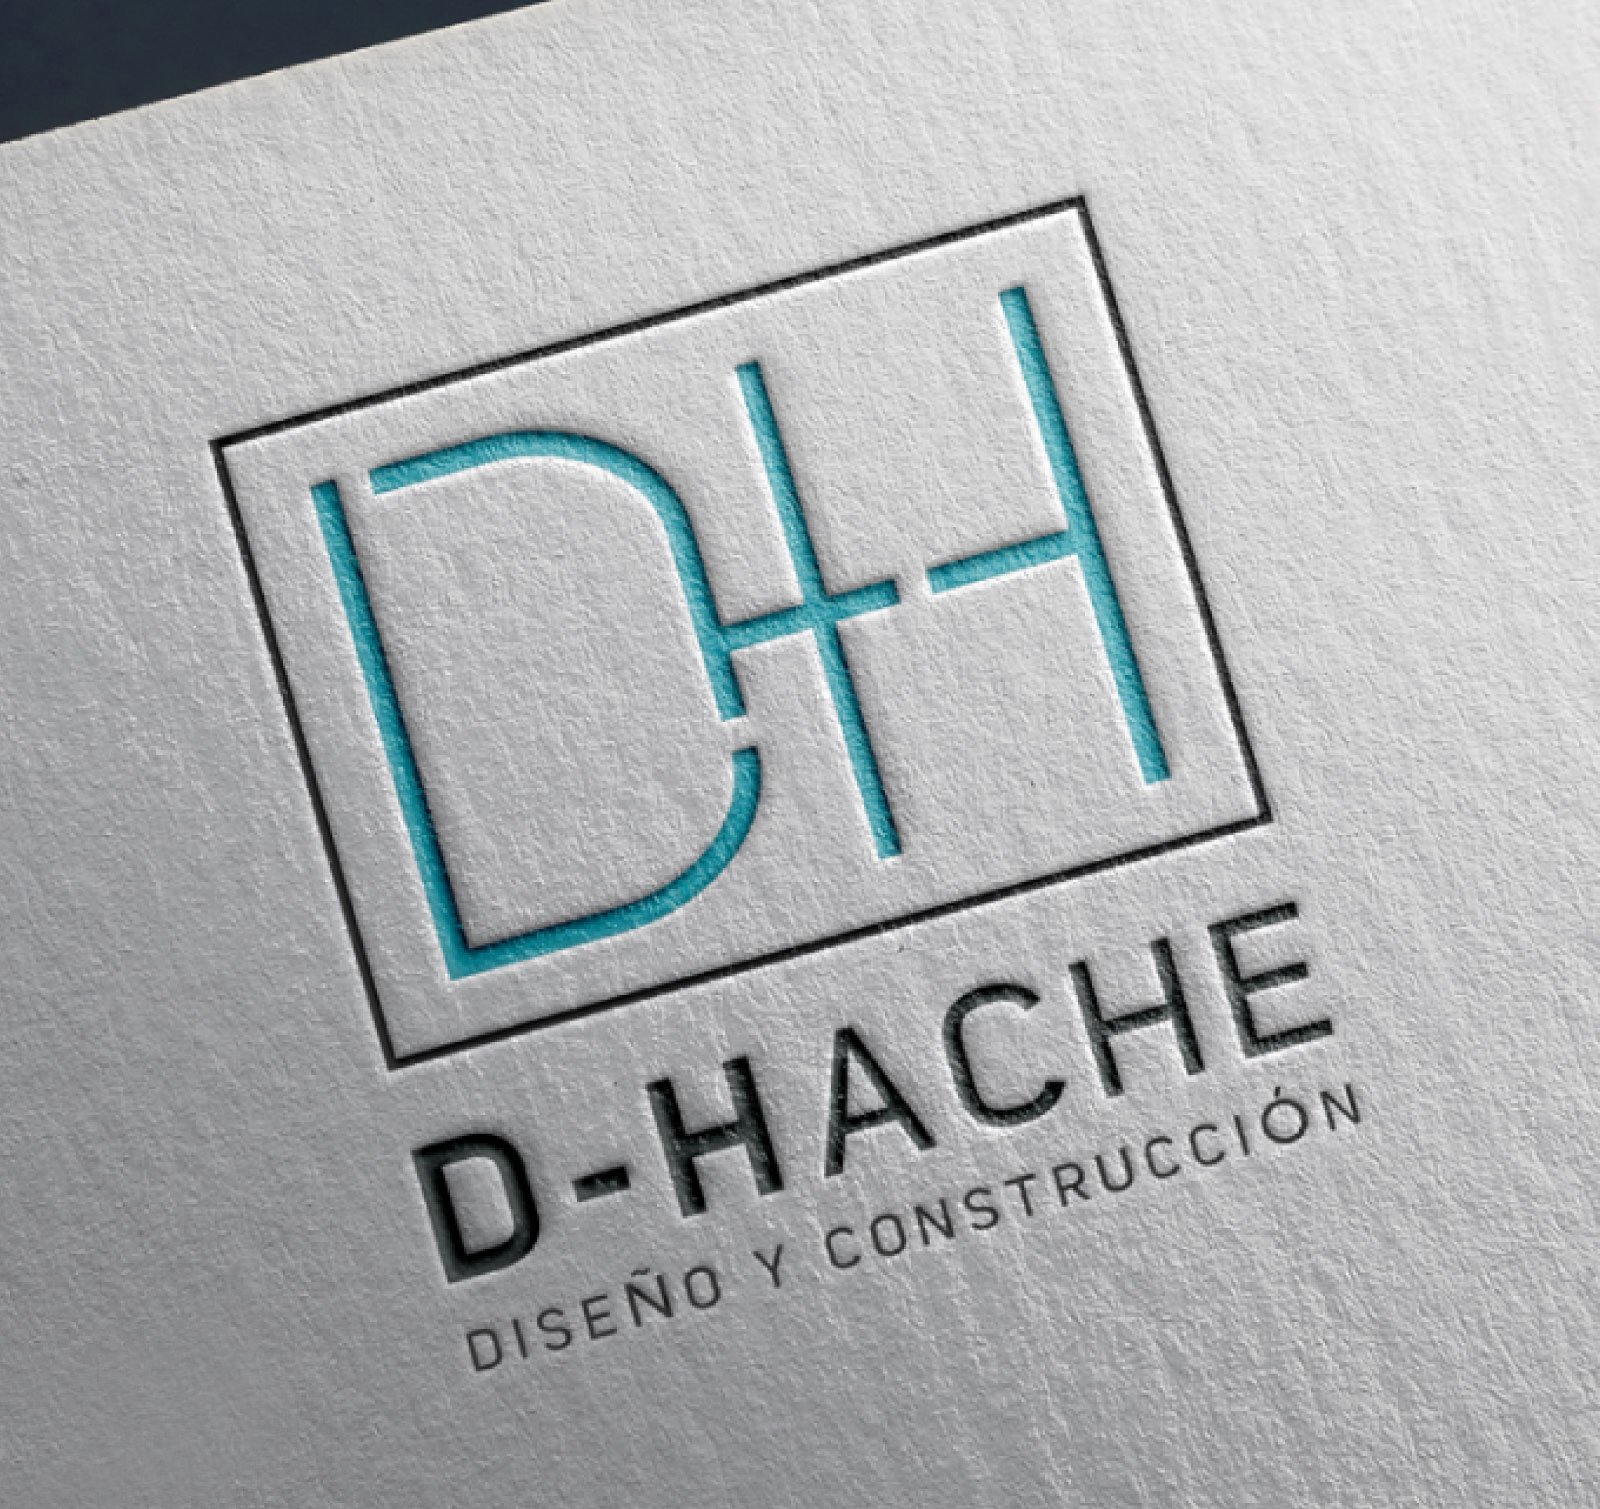 Identidad Corporativa D-HACHE